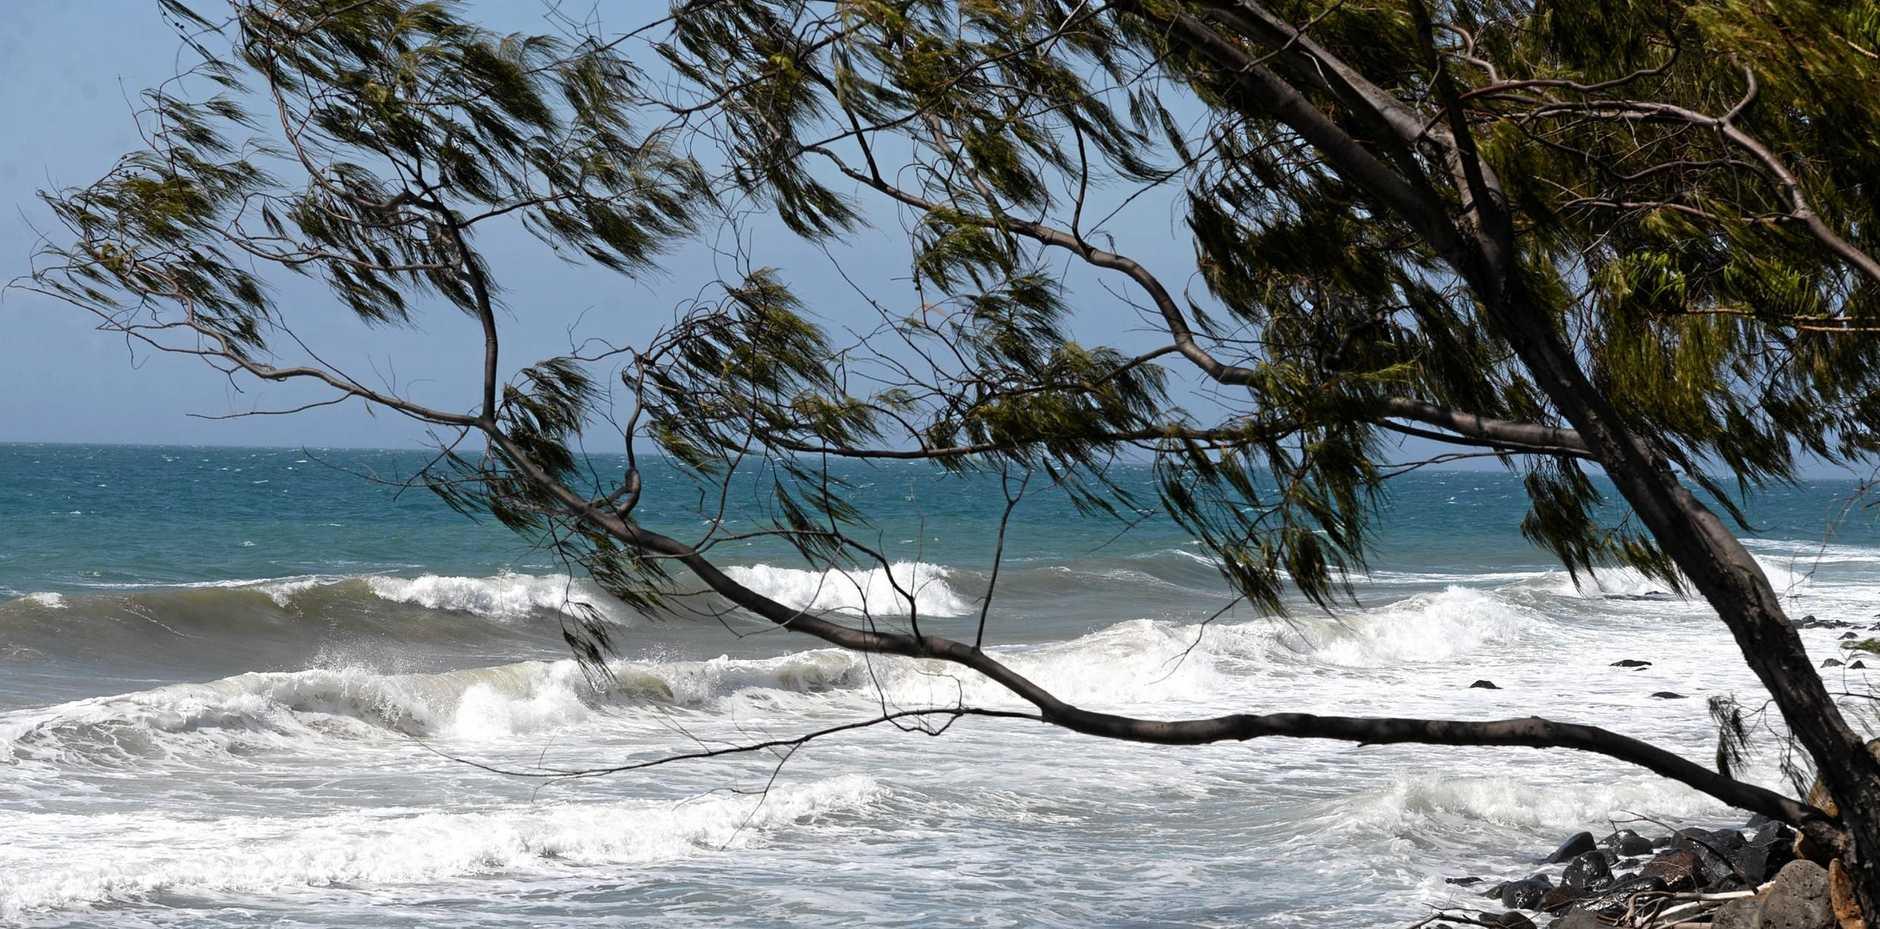 BLUSTERY WEATHER: Windy weather along the Bargara coastline.